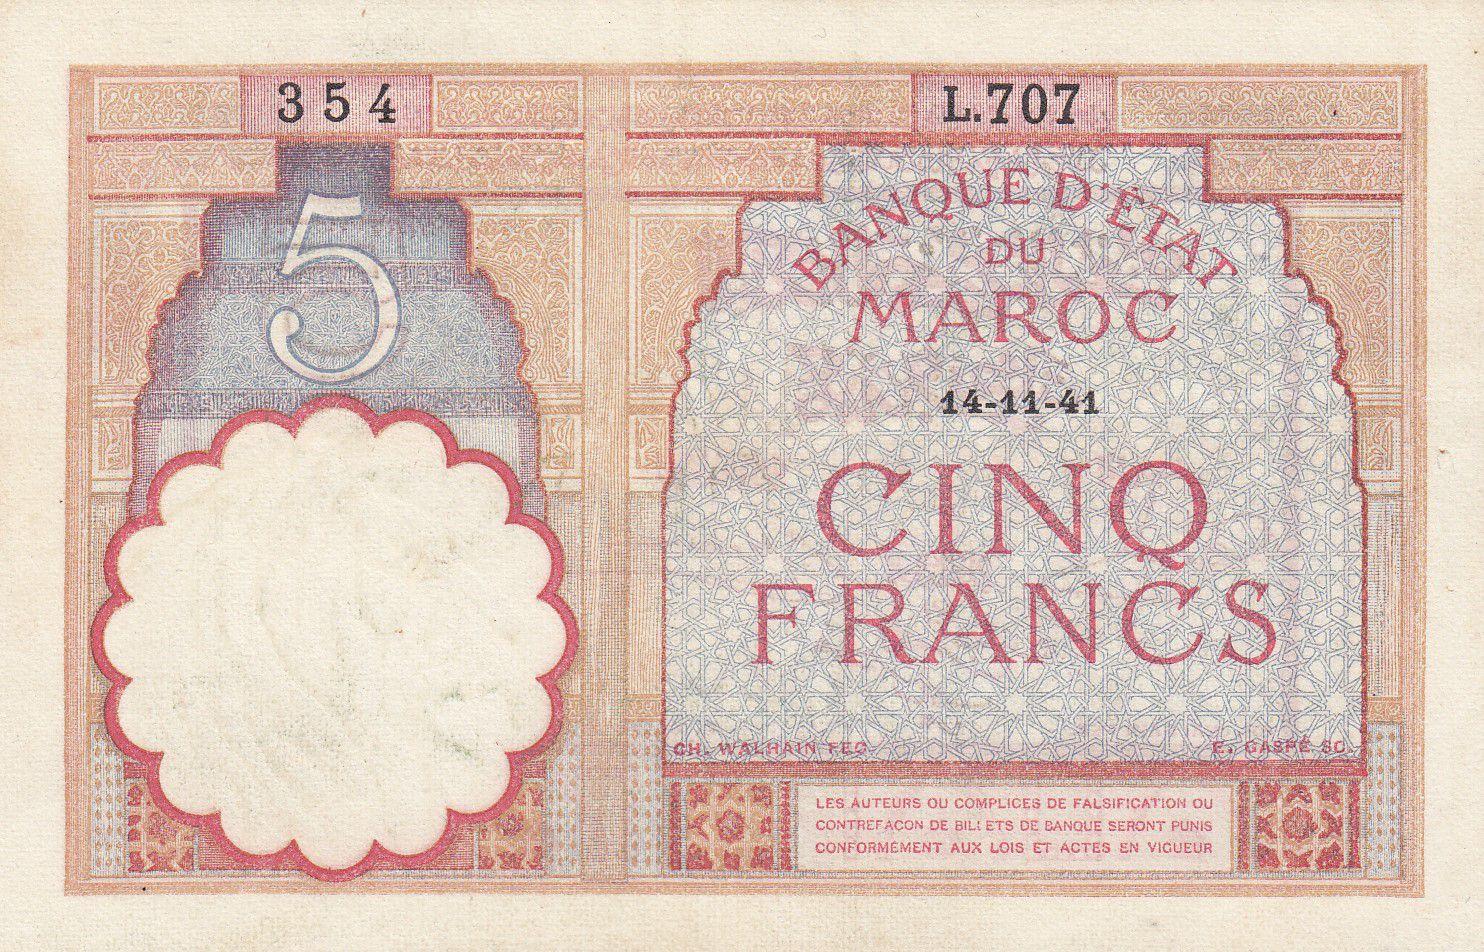 Morocco 5 Francs 14-11-1941 - XF  - Serial L.707 - P.23Ab